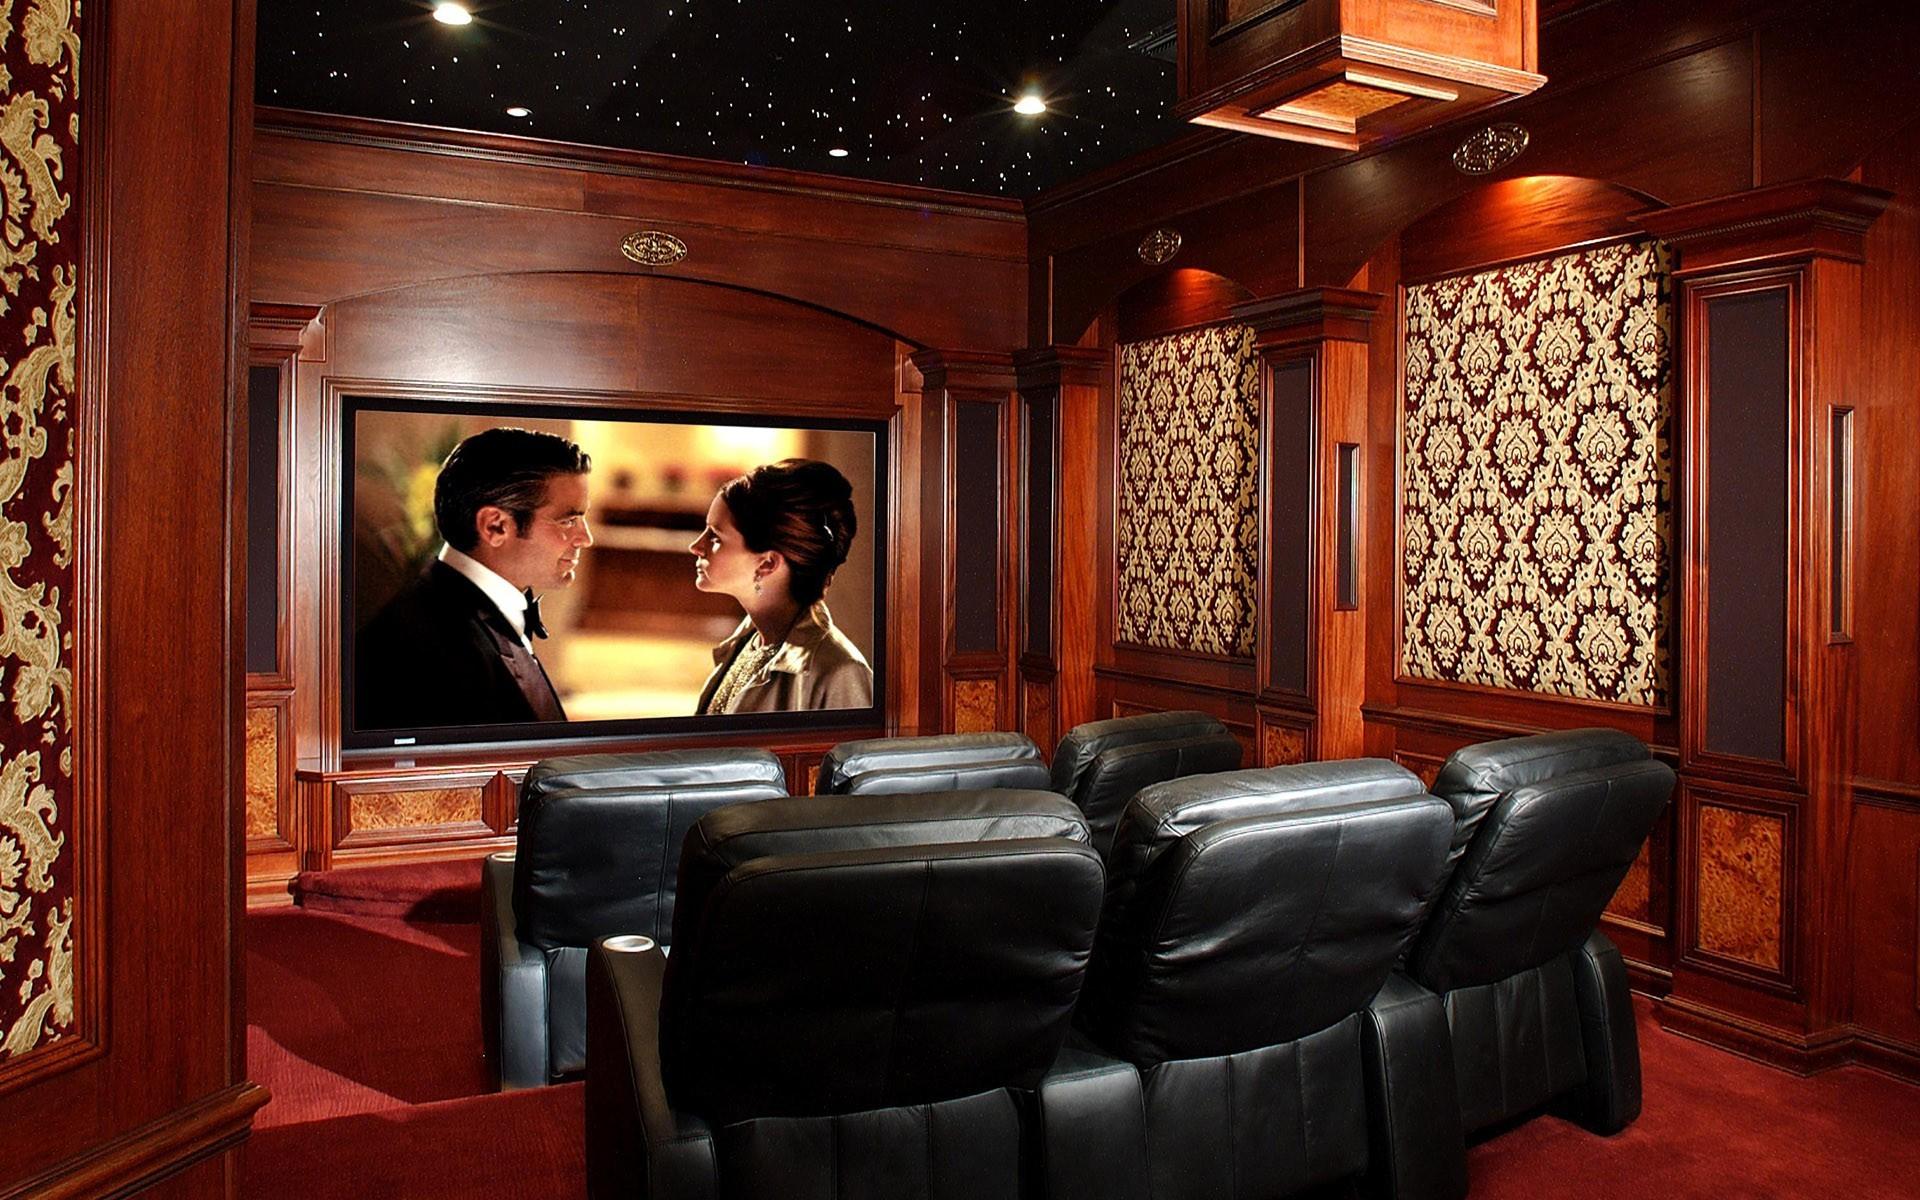 Movie theater wallpaper wallpapersafari for Wallpaper home film